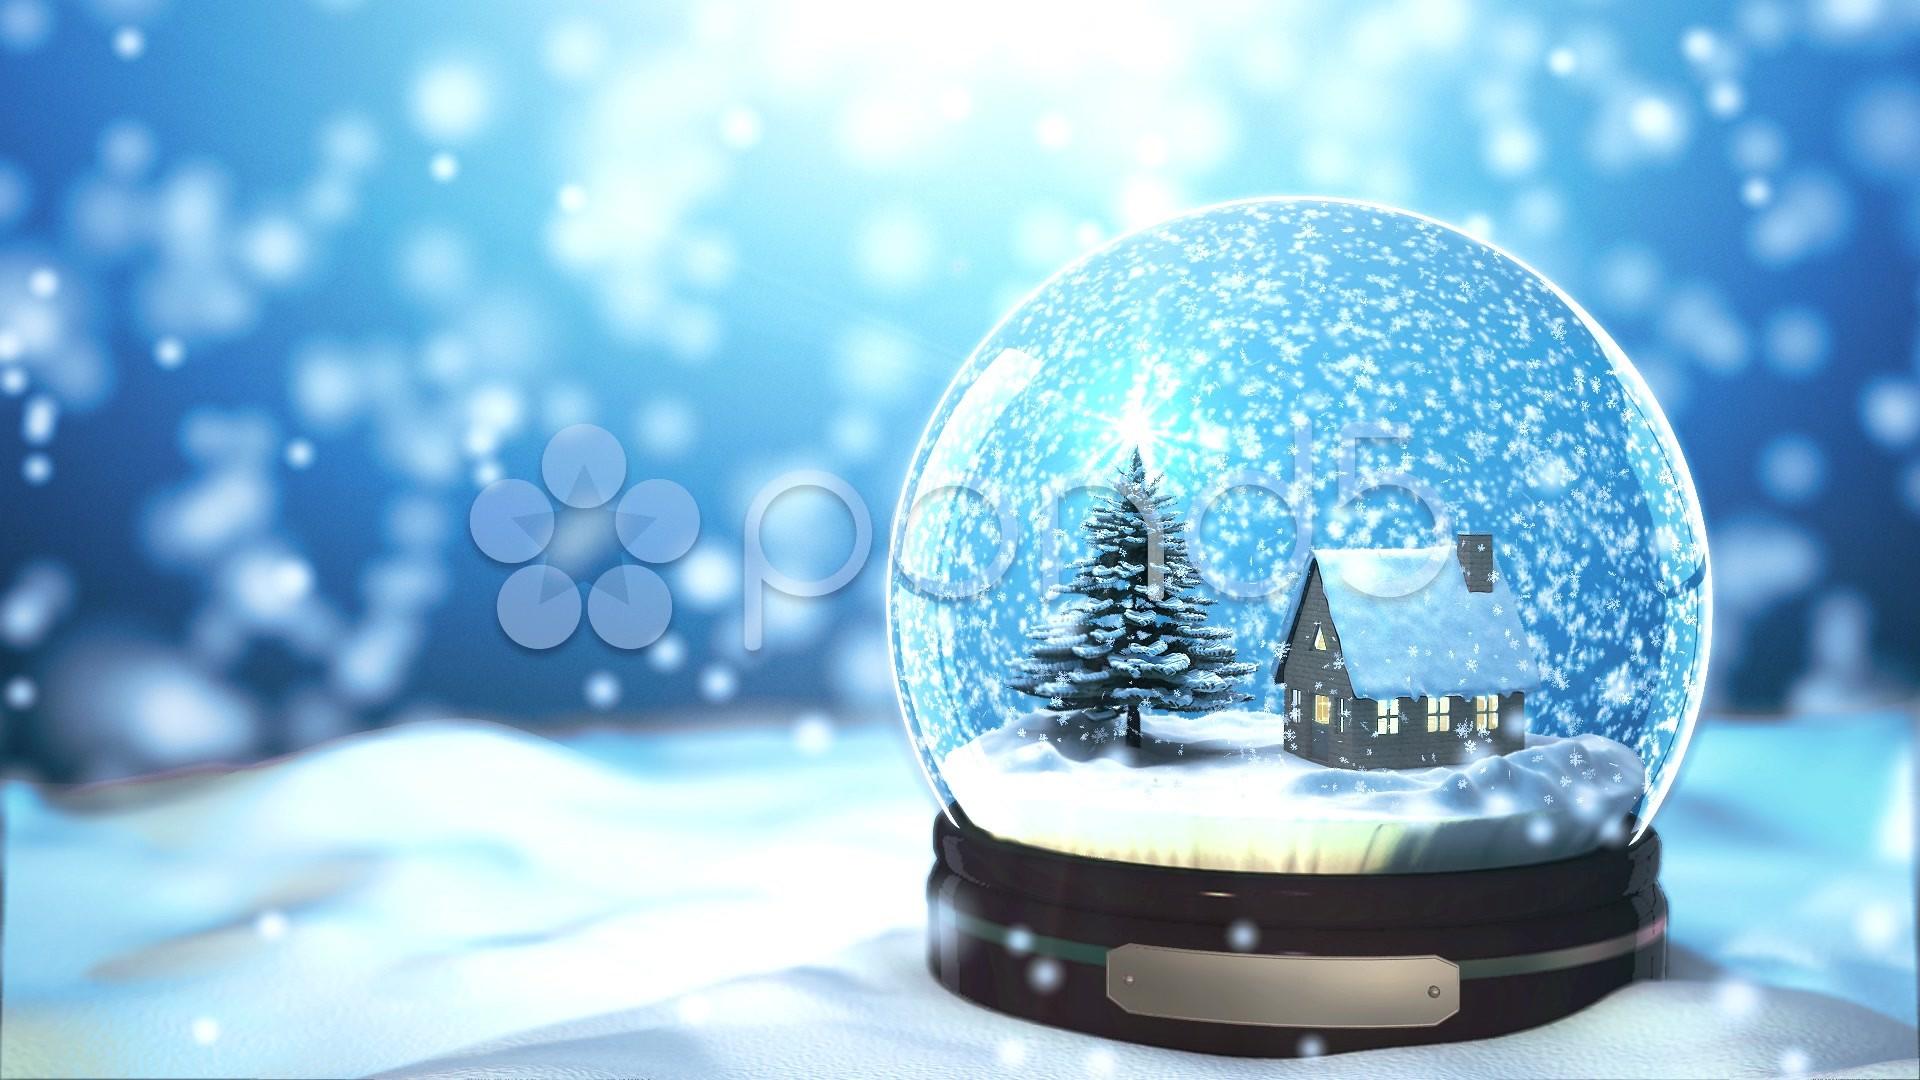 Res: 1920x1080, Christmas Snow globe Snowflake with Snowfall on Blue Background ~ Hi .